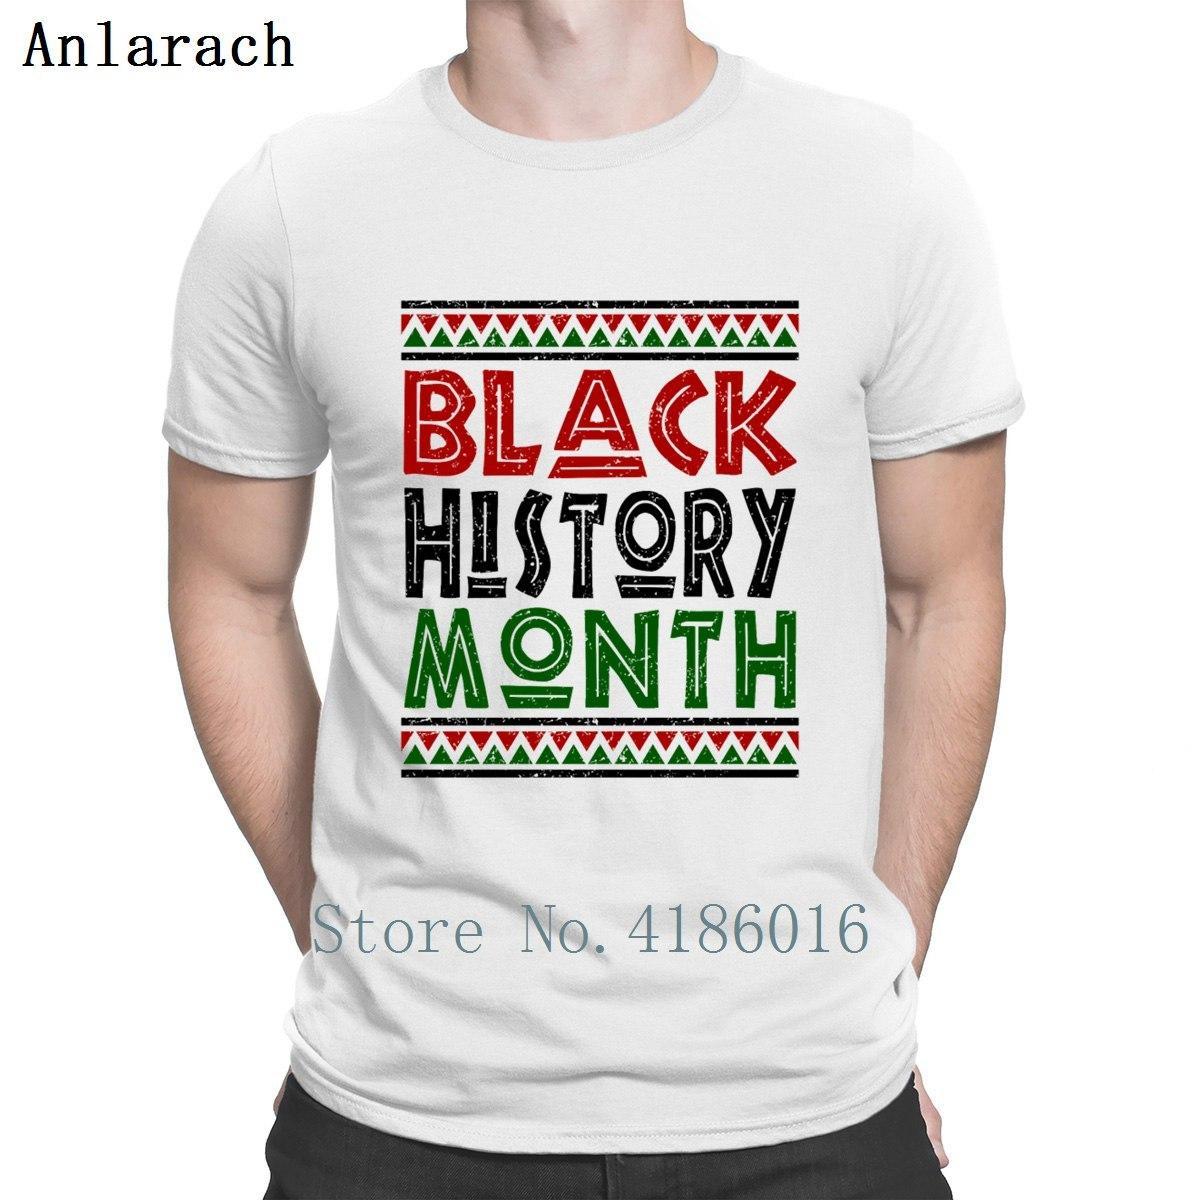 Black Wine Storia Mese Mese T-Shirt Sito web Primavera Uomo Moda Senior T-Shirt Uomo Uomo Uomo Final Creazione gratuita